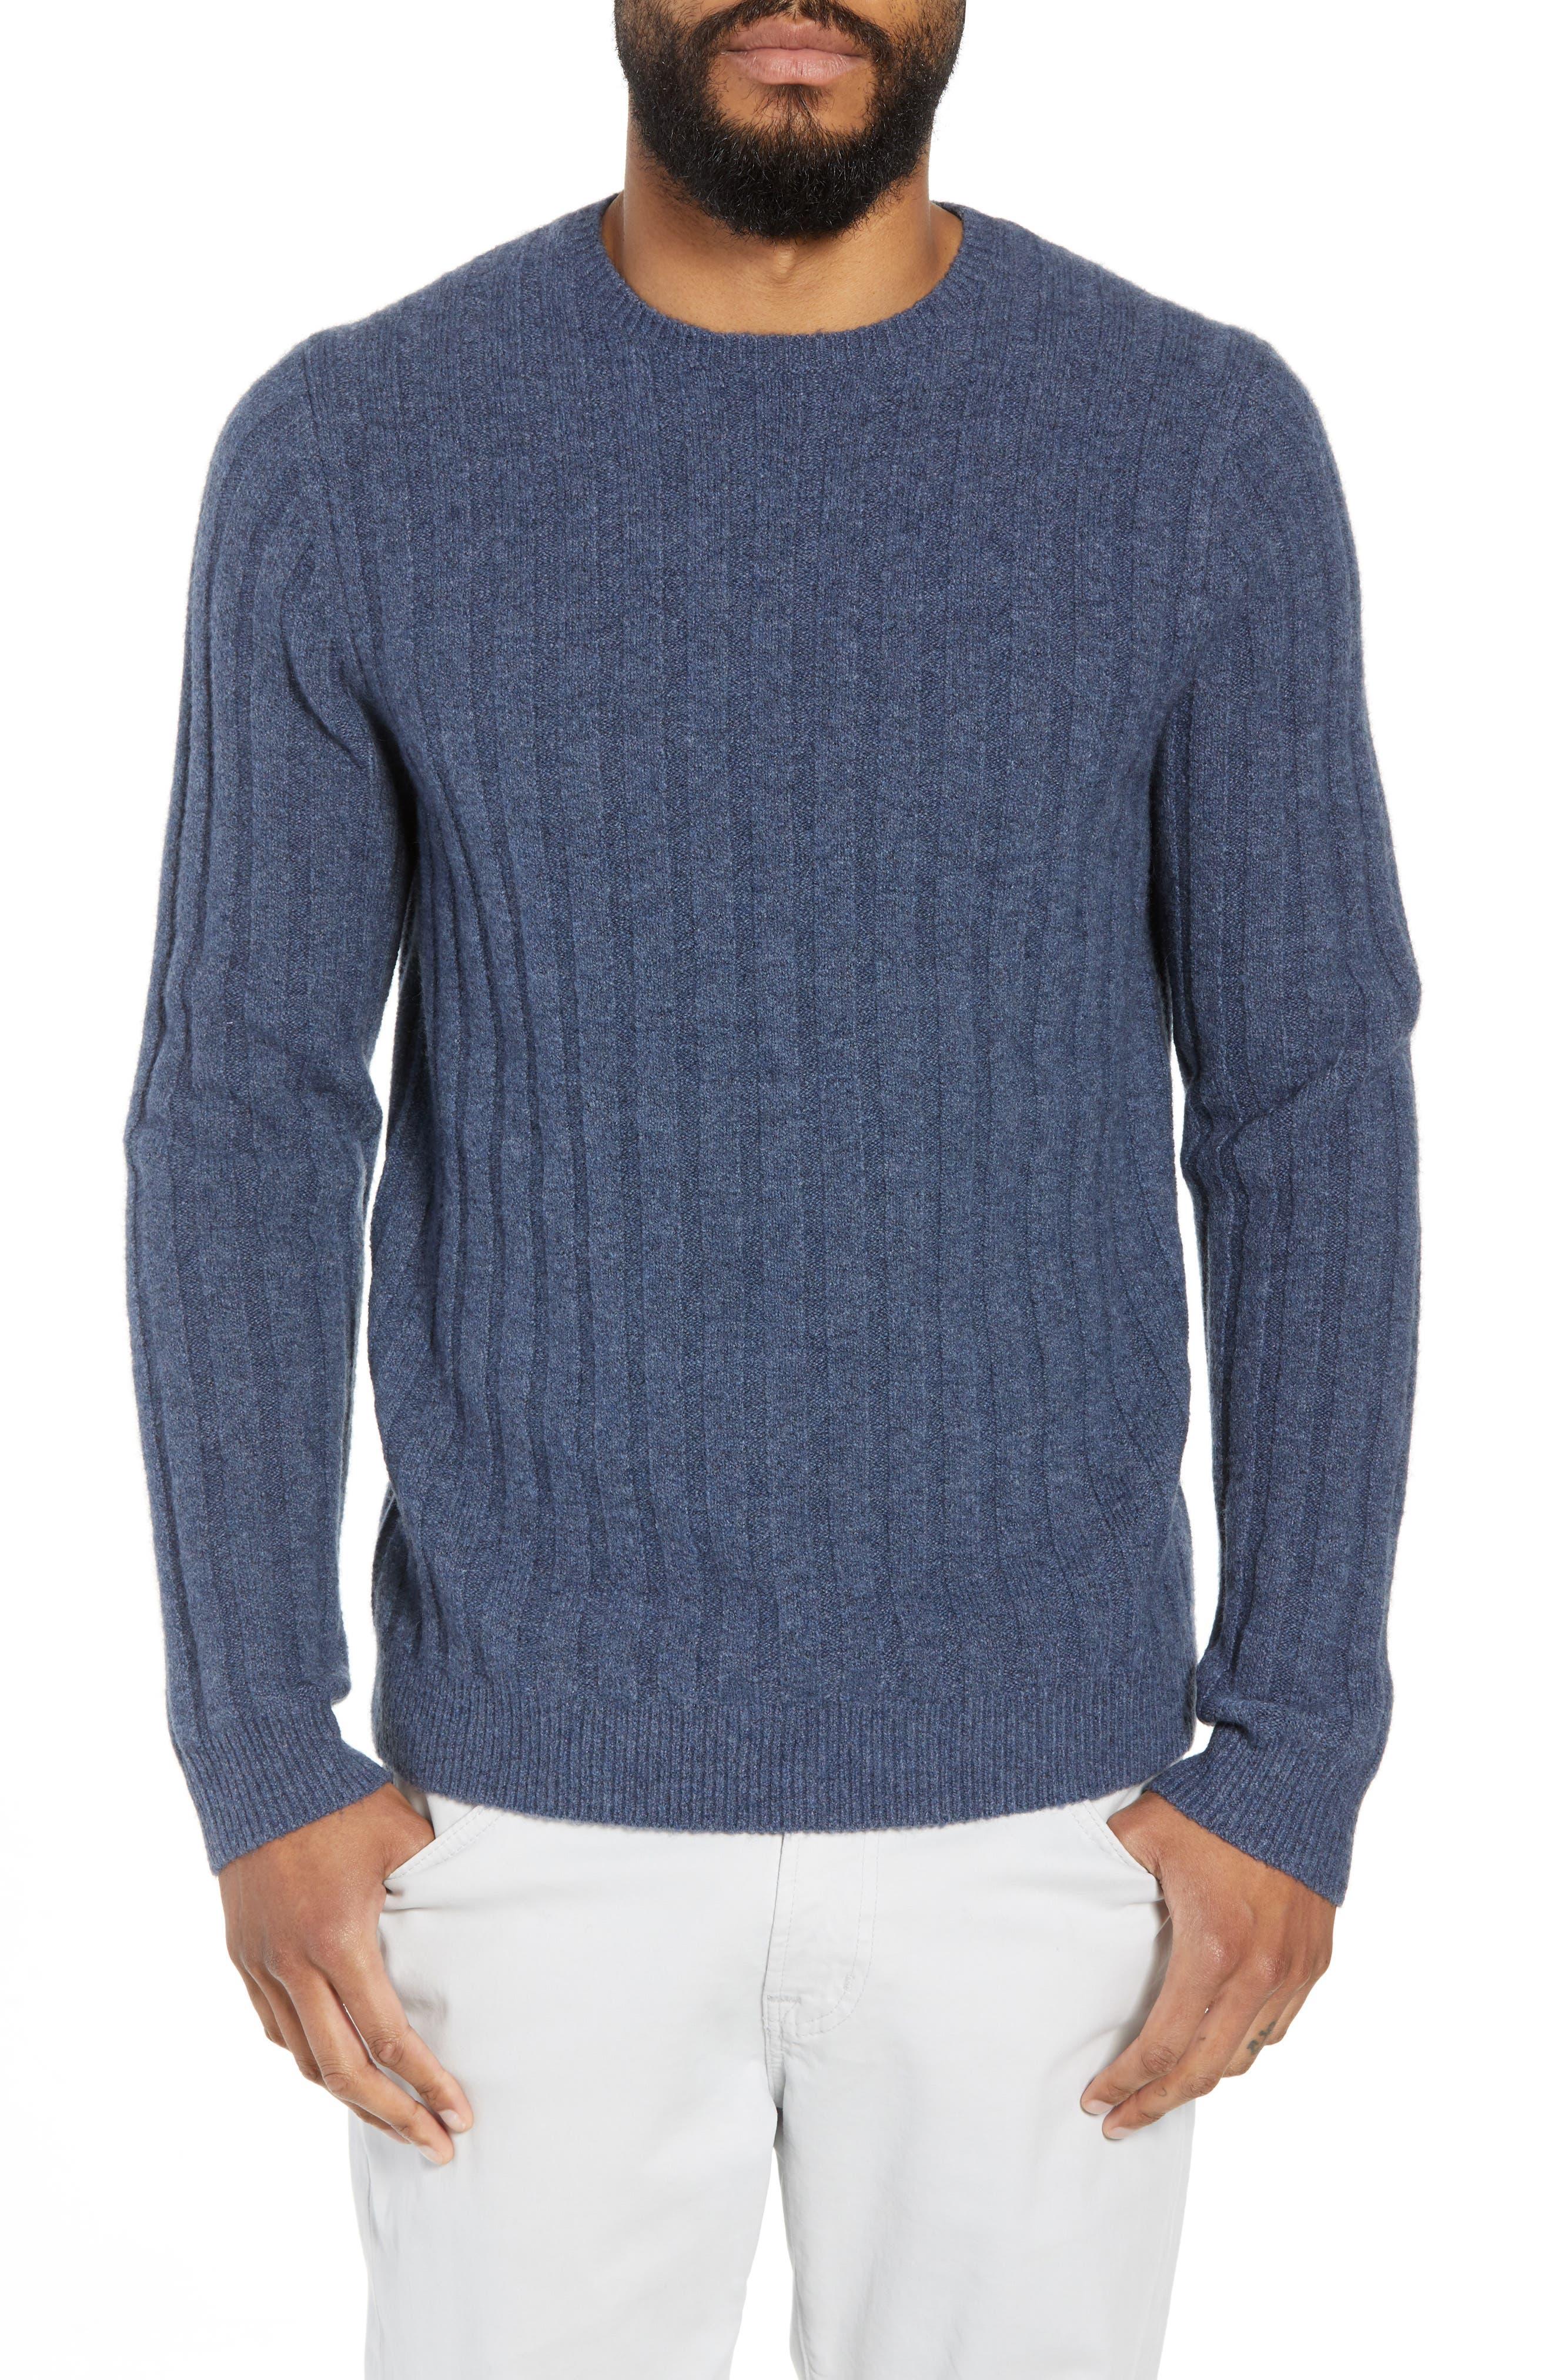 Image of CALIBRATE Rib Crewneck Sweater